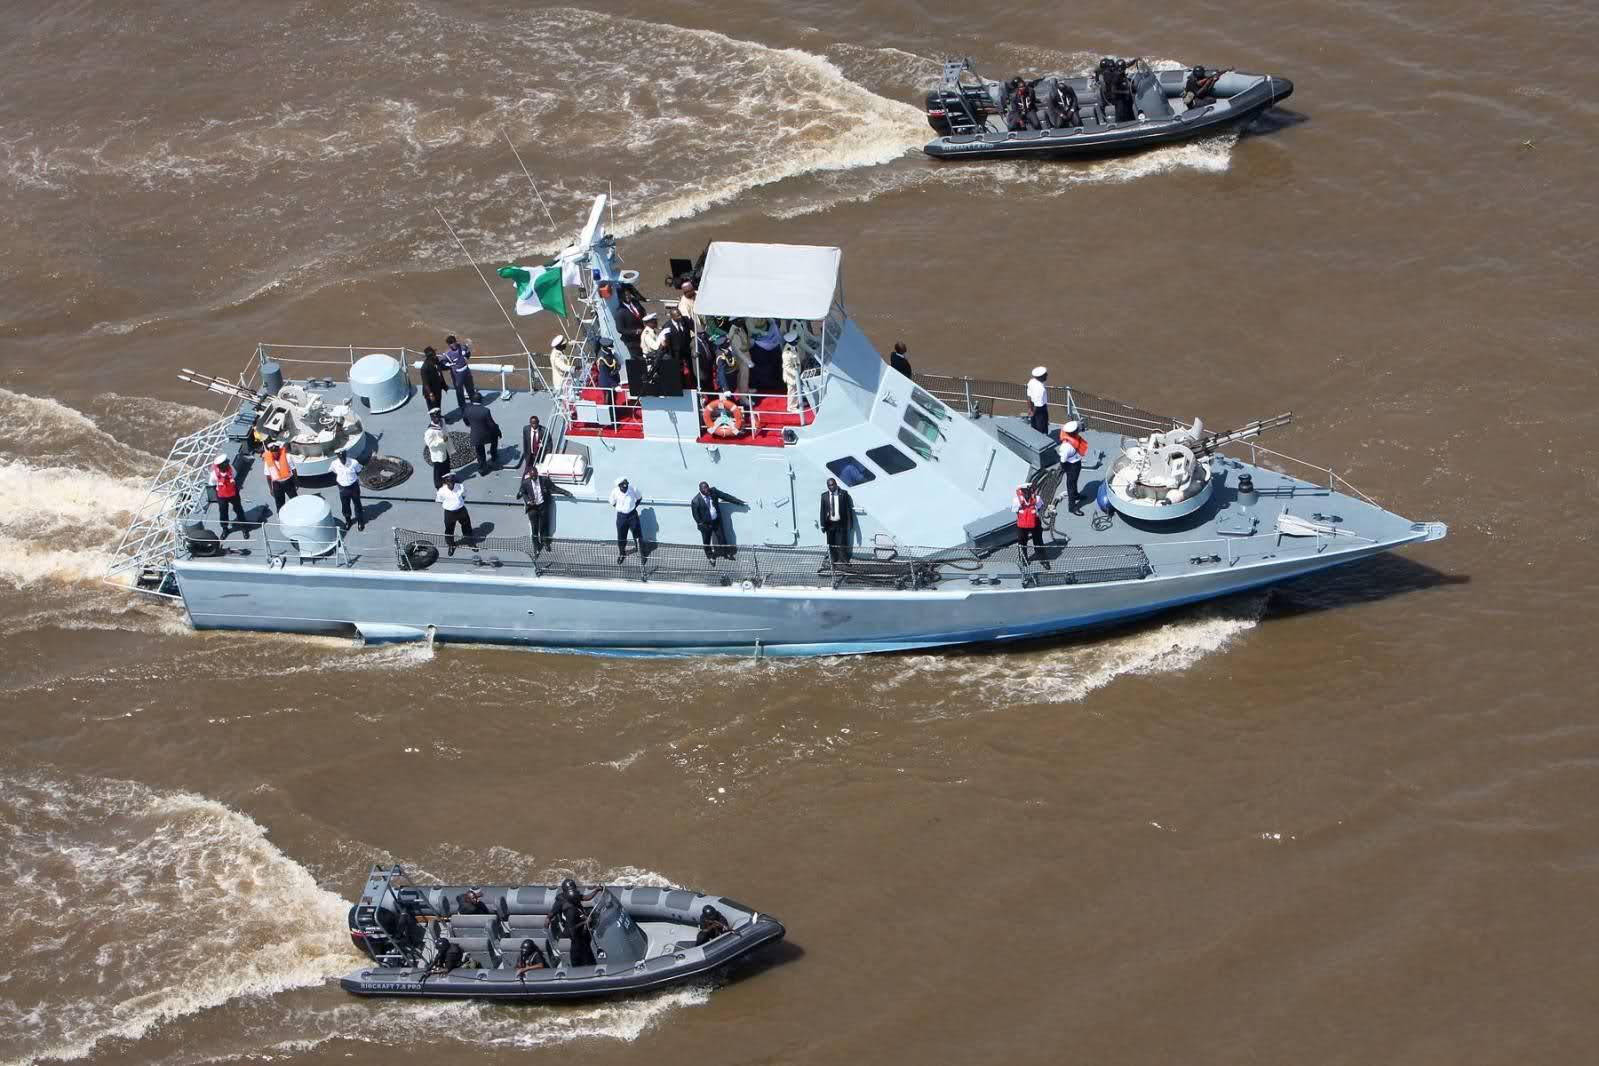 Armée Nigériane / Nigerian Armed Forces - Page 2 2mwtqpl